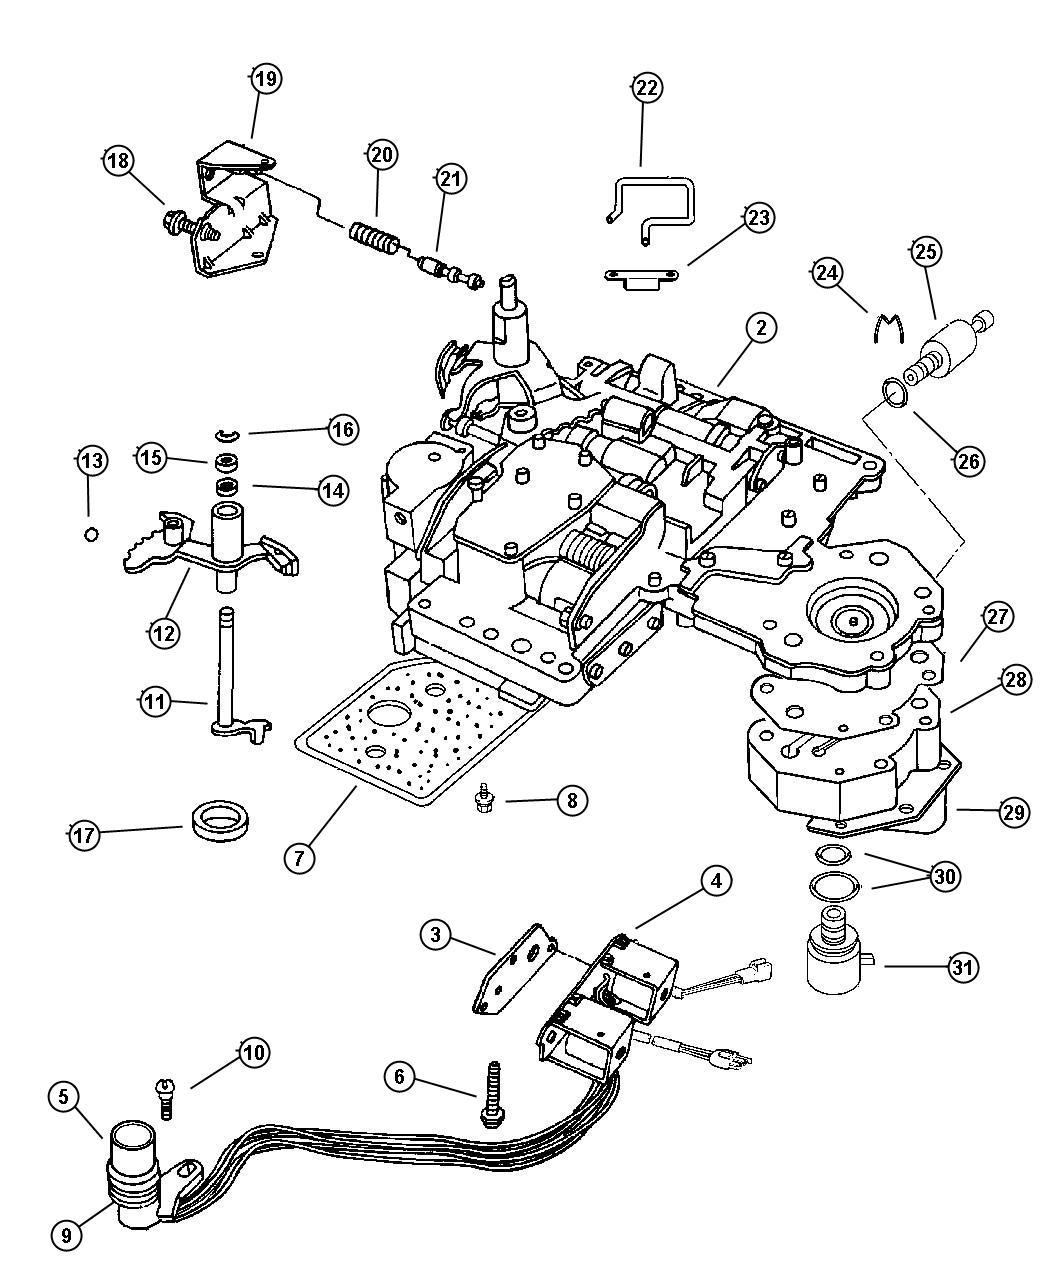 2009 Jeep Liberty Transducer  Pressure Sensor  4 Prong Connector  52119522 Ac  W   Bgj  W  Bgj